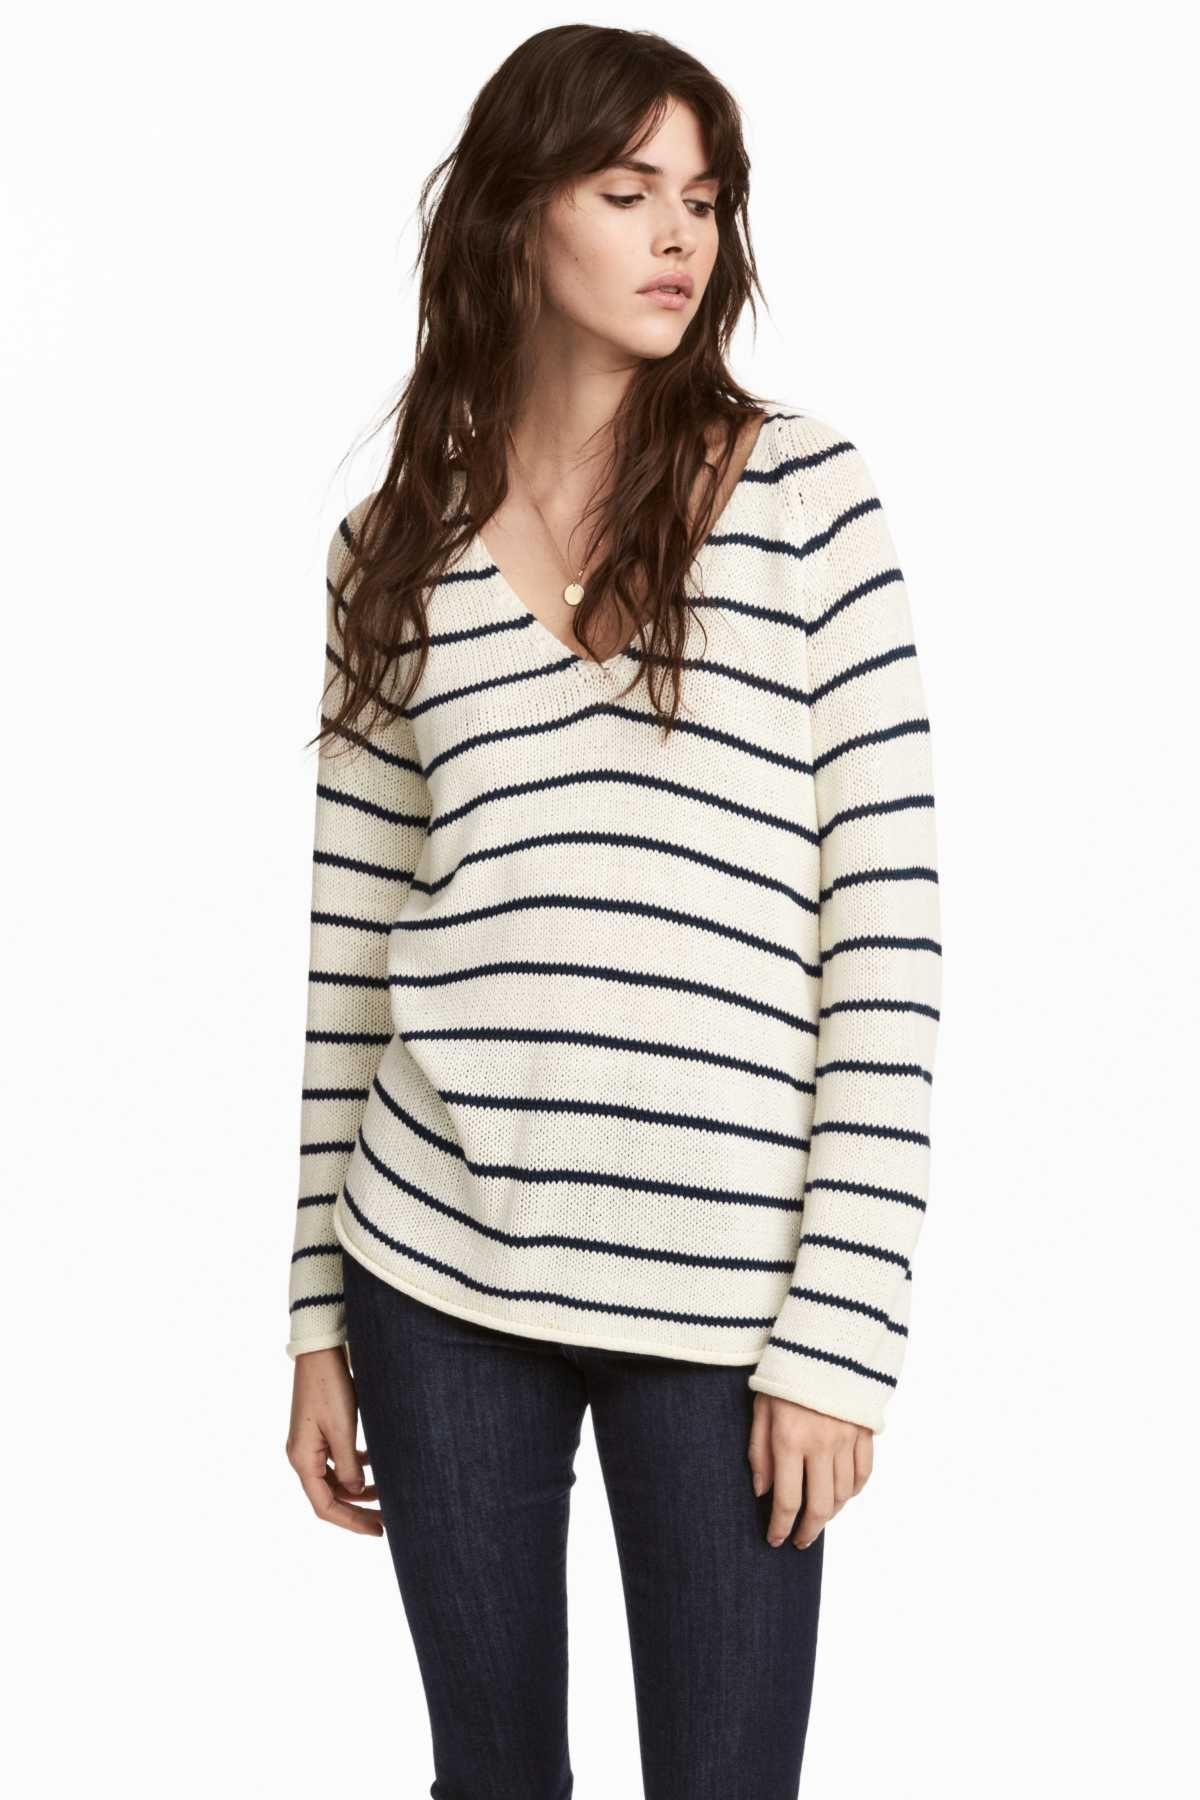 e5dba8a561 White blue striped. Soft